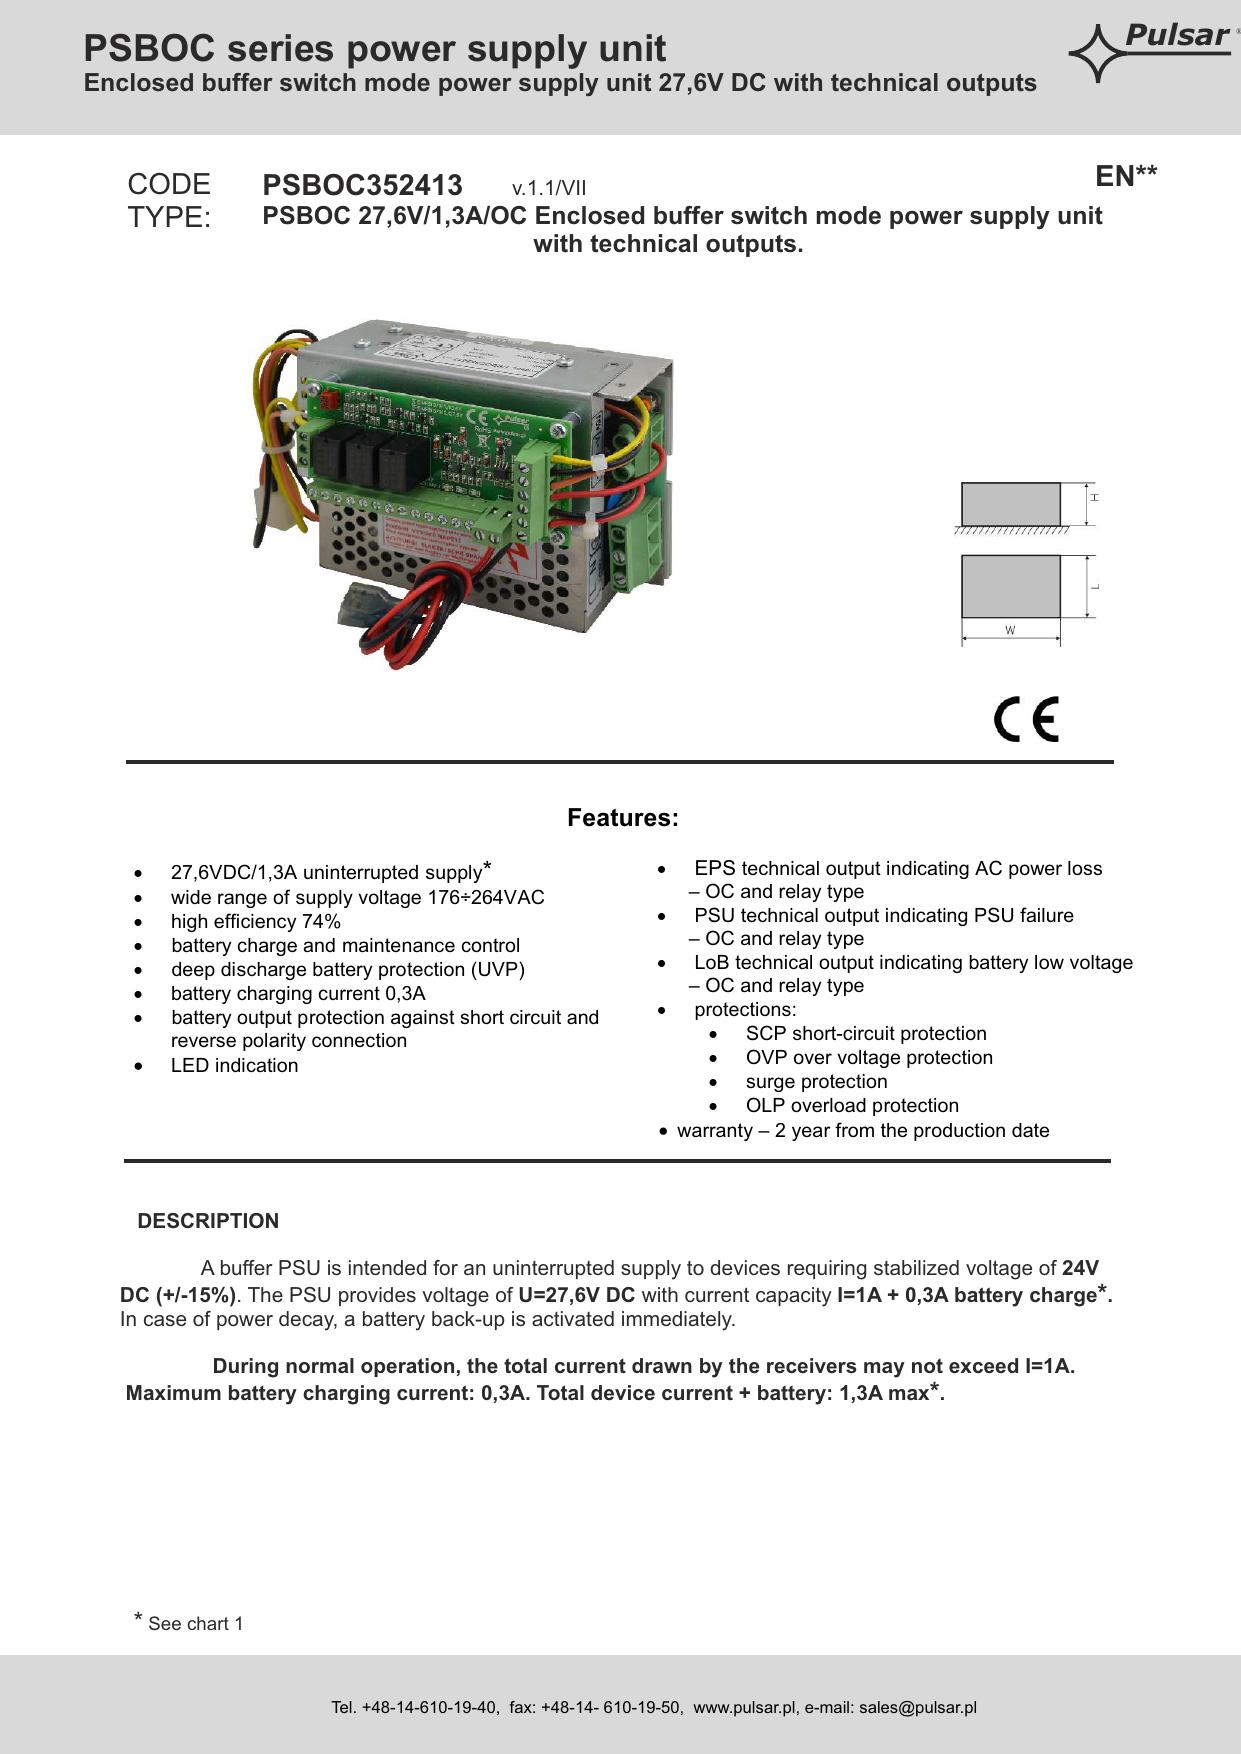 PSBOC series power supply unit | manualzz com